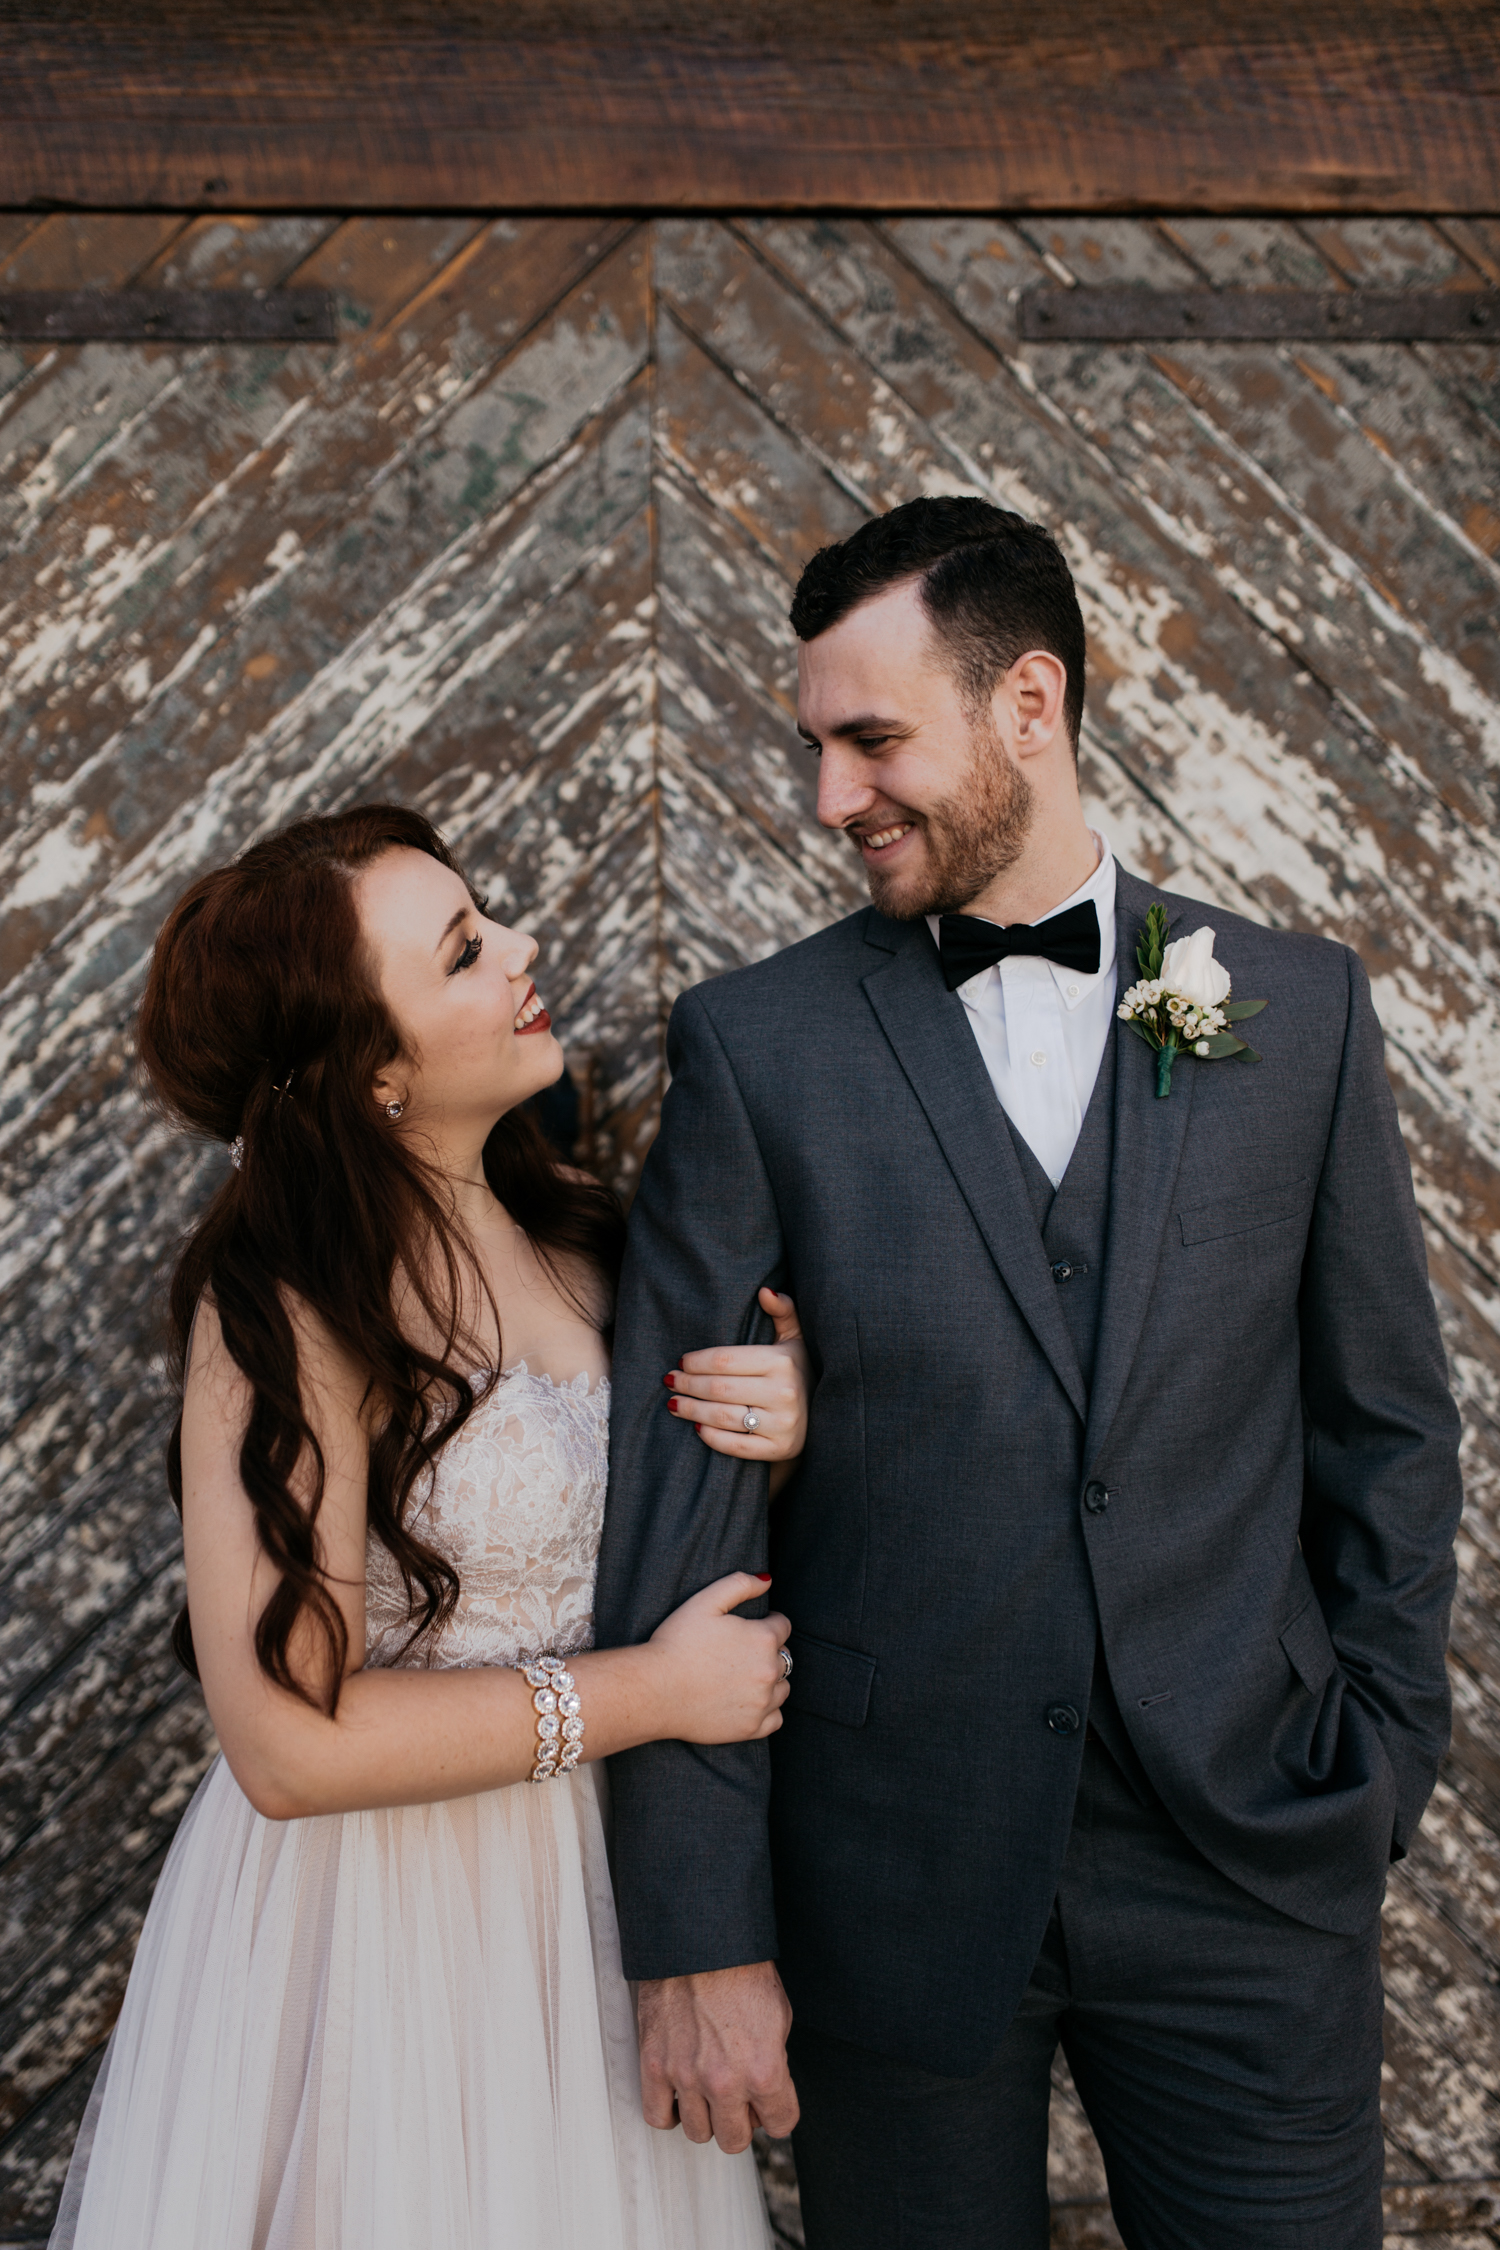 Yellow+Bird+Visuals+Destination+Wedding+Photographer-4891